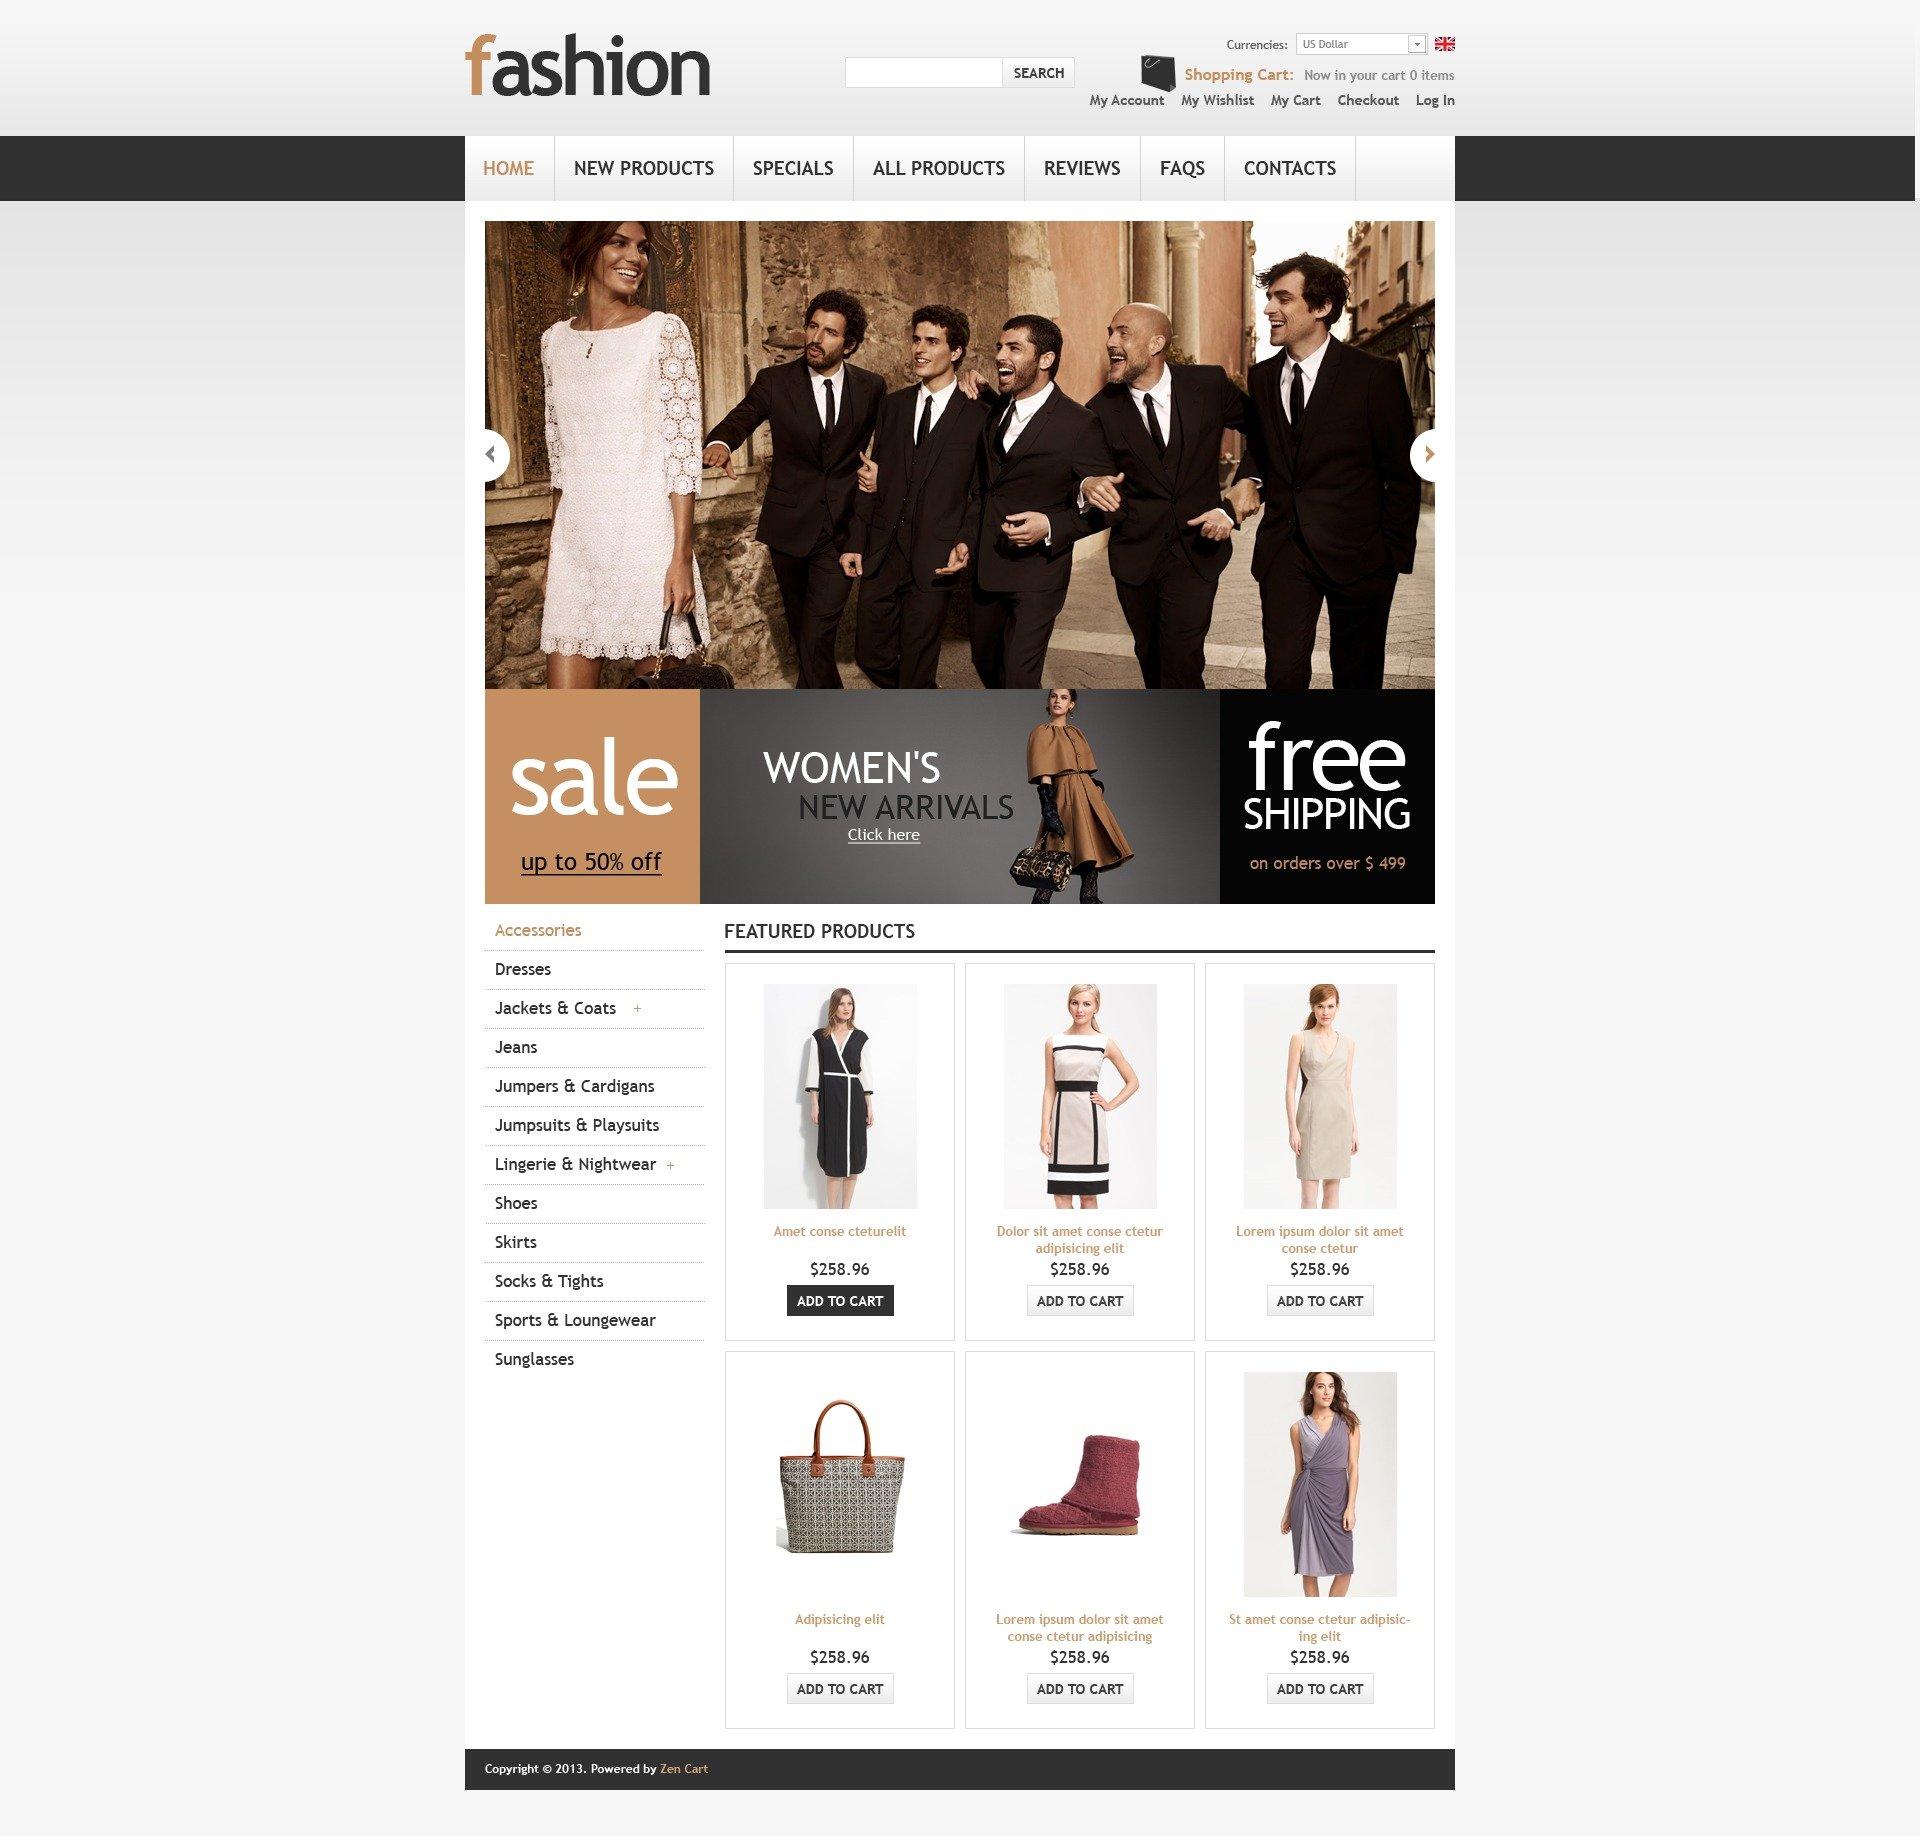 Classy Fashion Store №43889 - скриншот